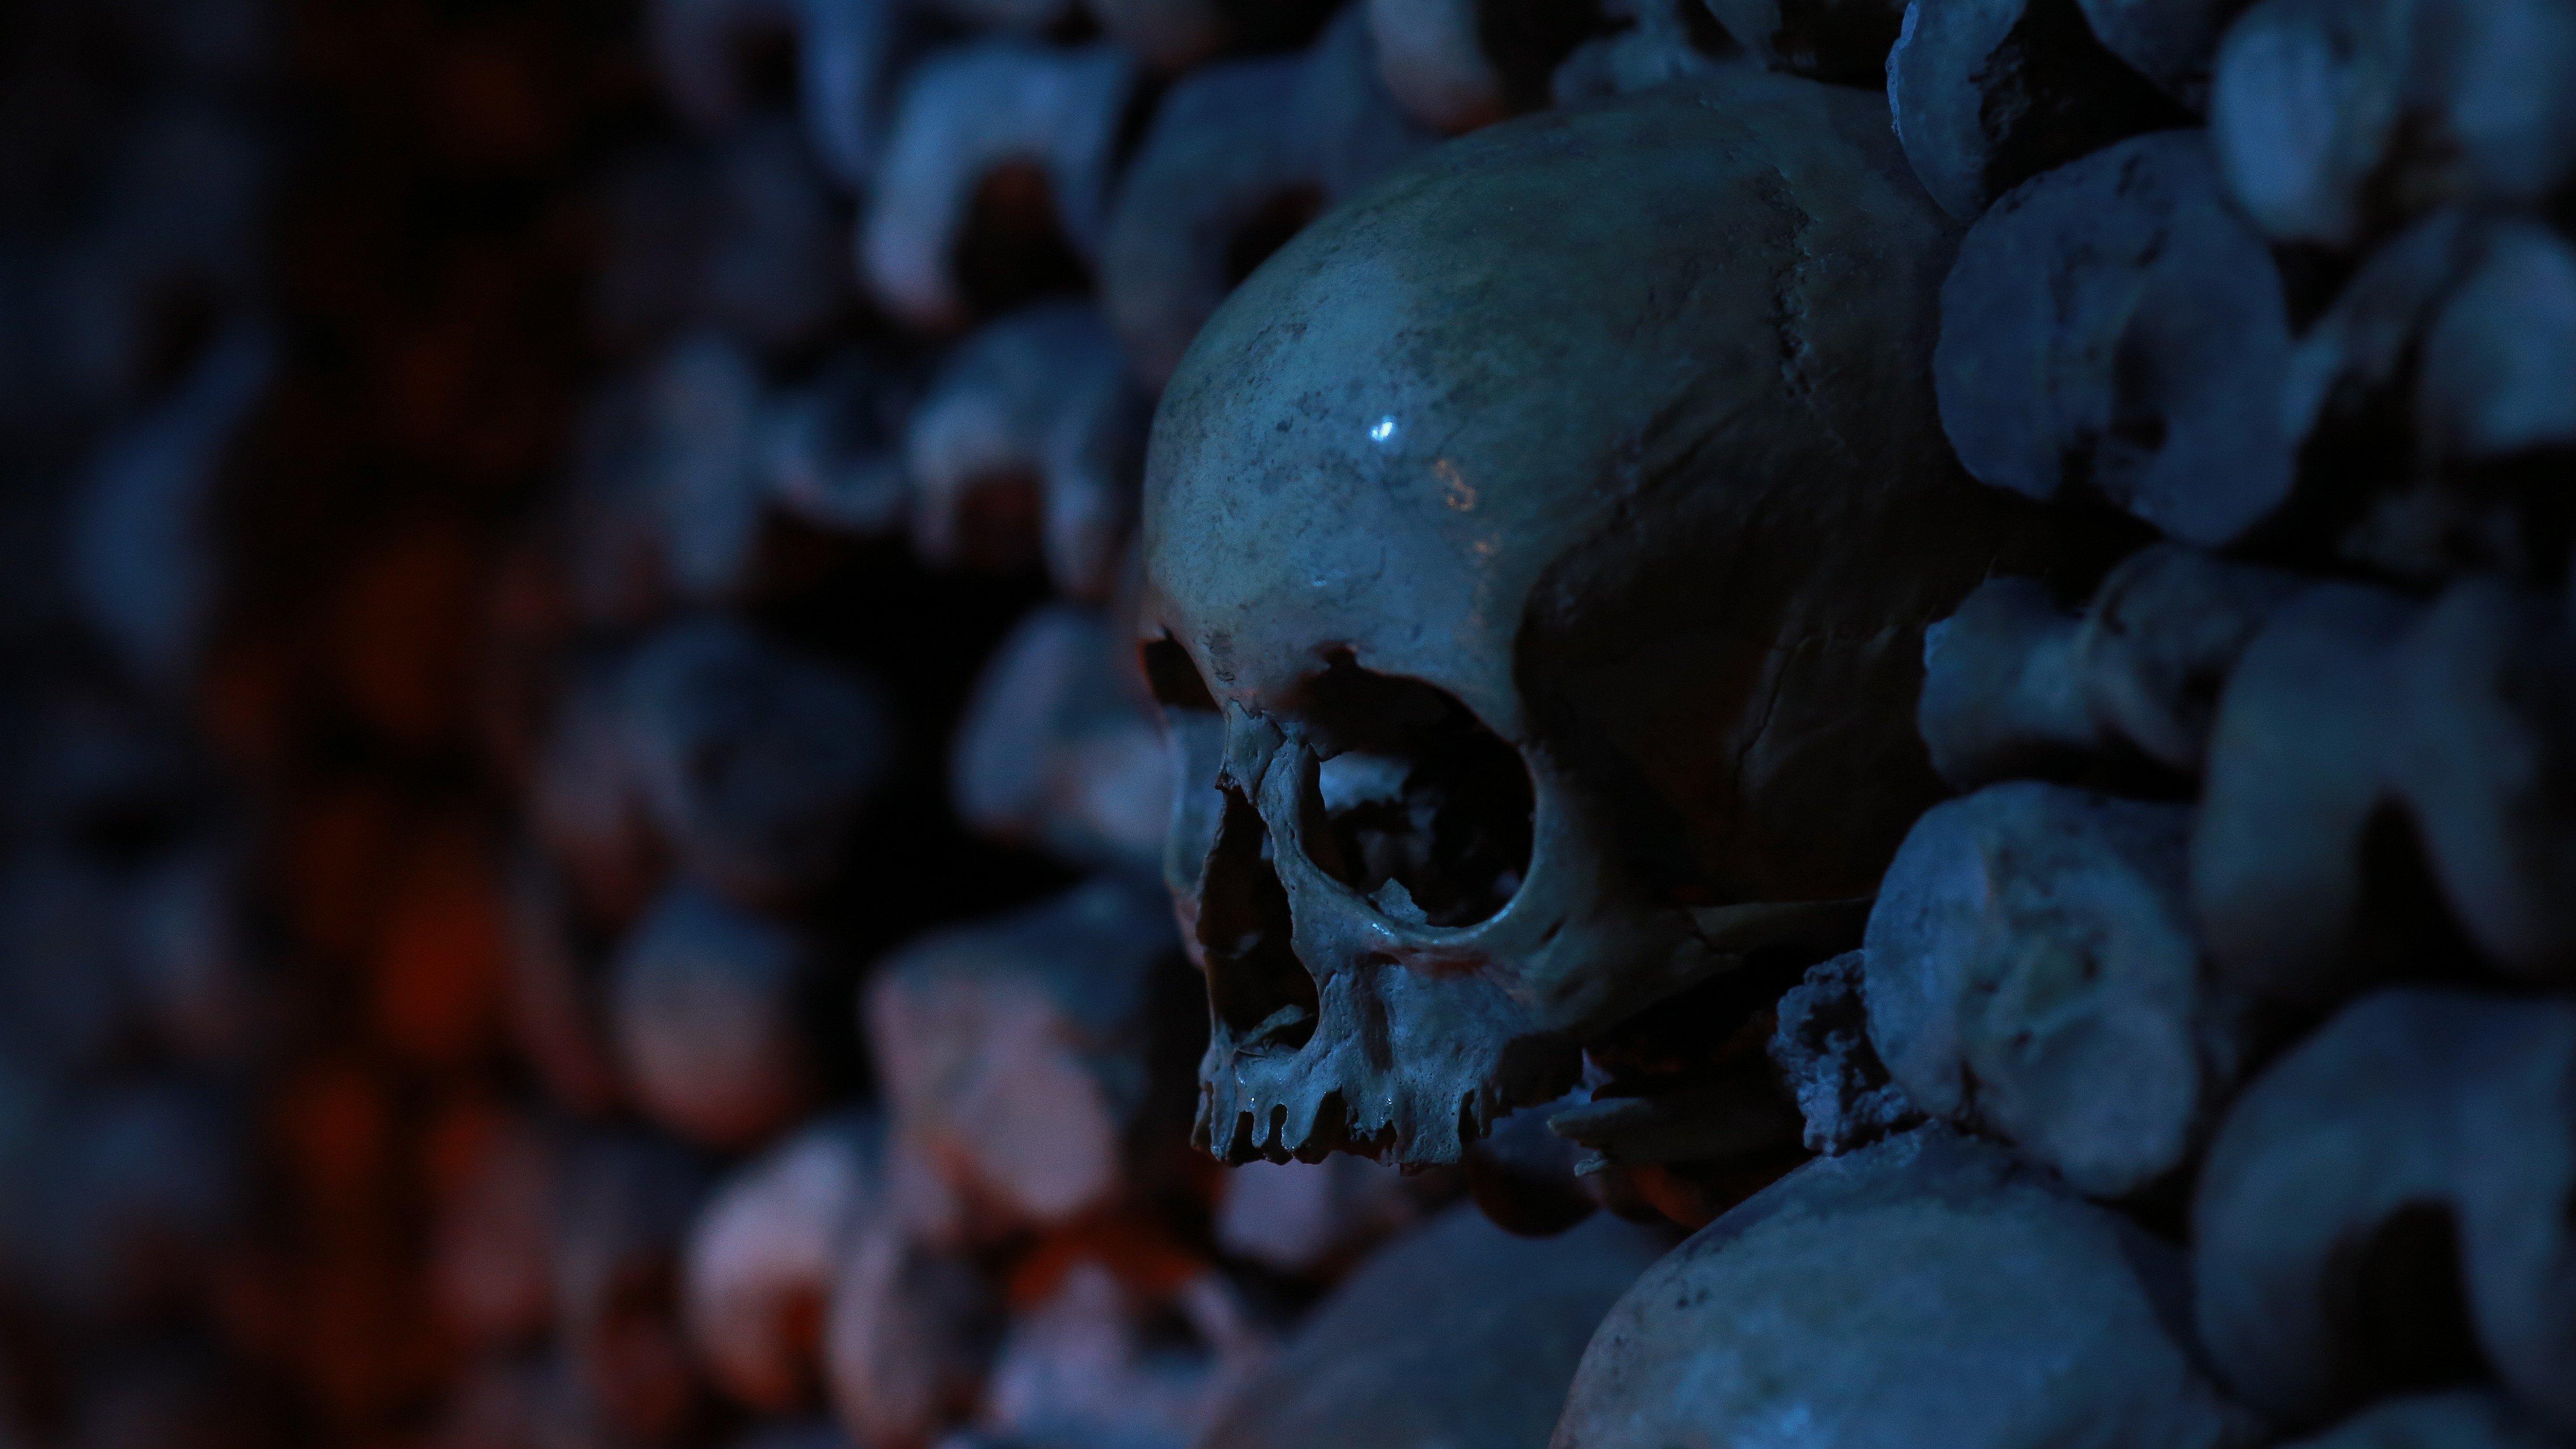 Skull Bones Depth Of Field Dark Hd Wallpapers Desktop HD Wallpapers Download Free Images Wallpaper [1000image.com]